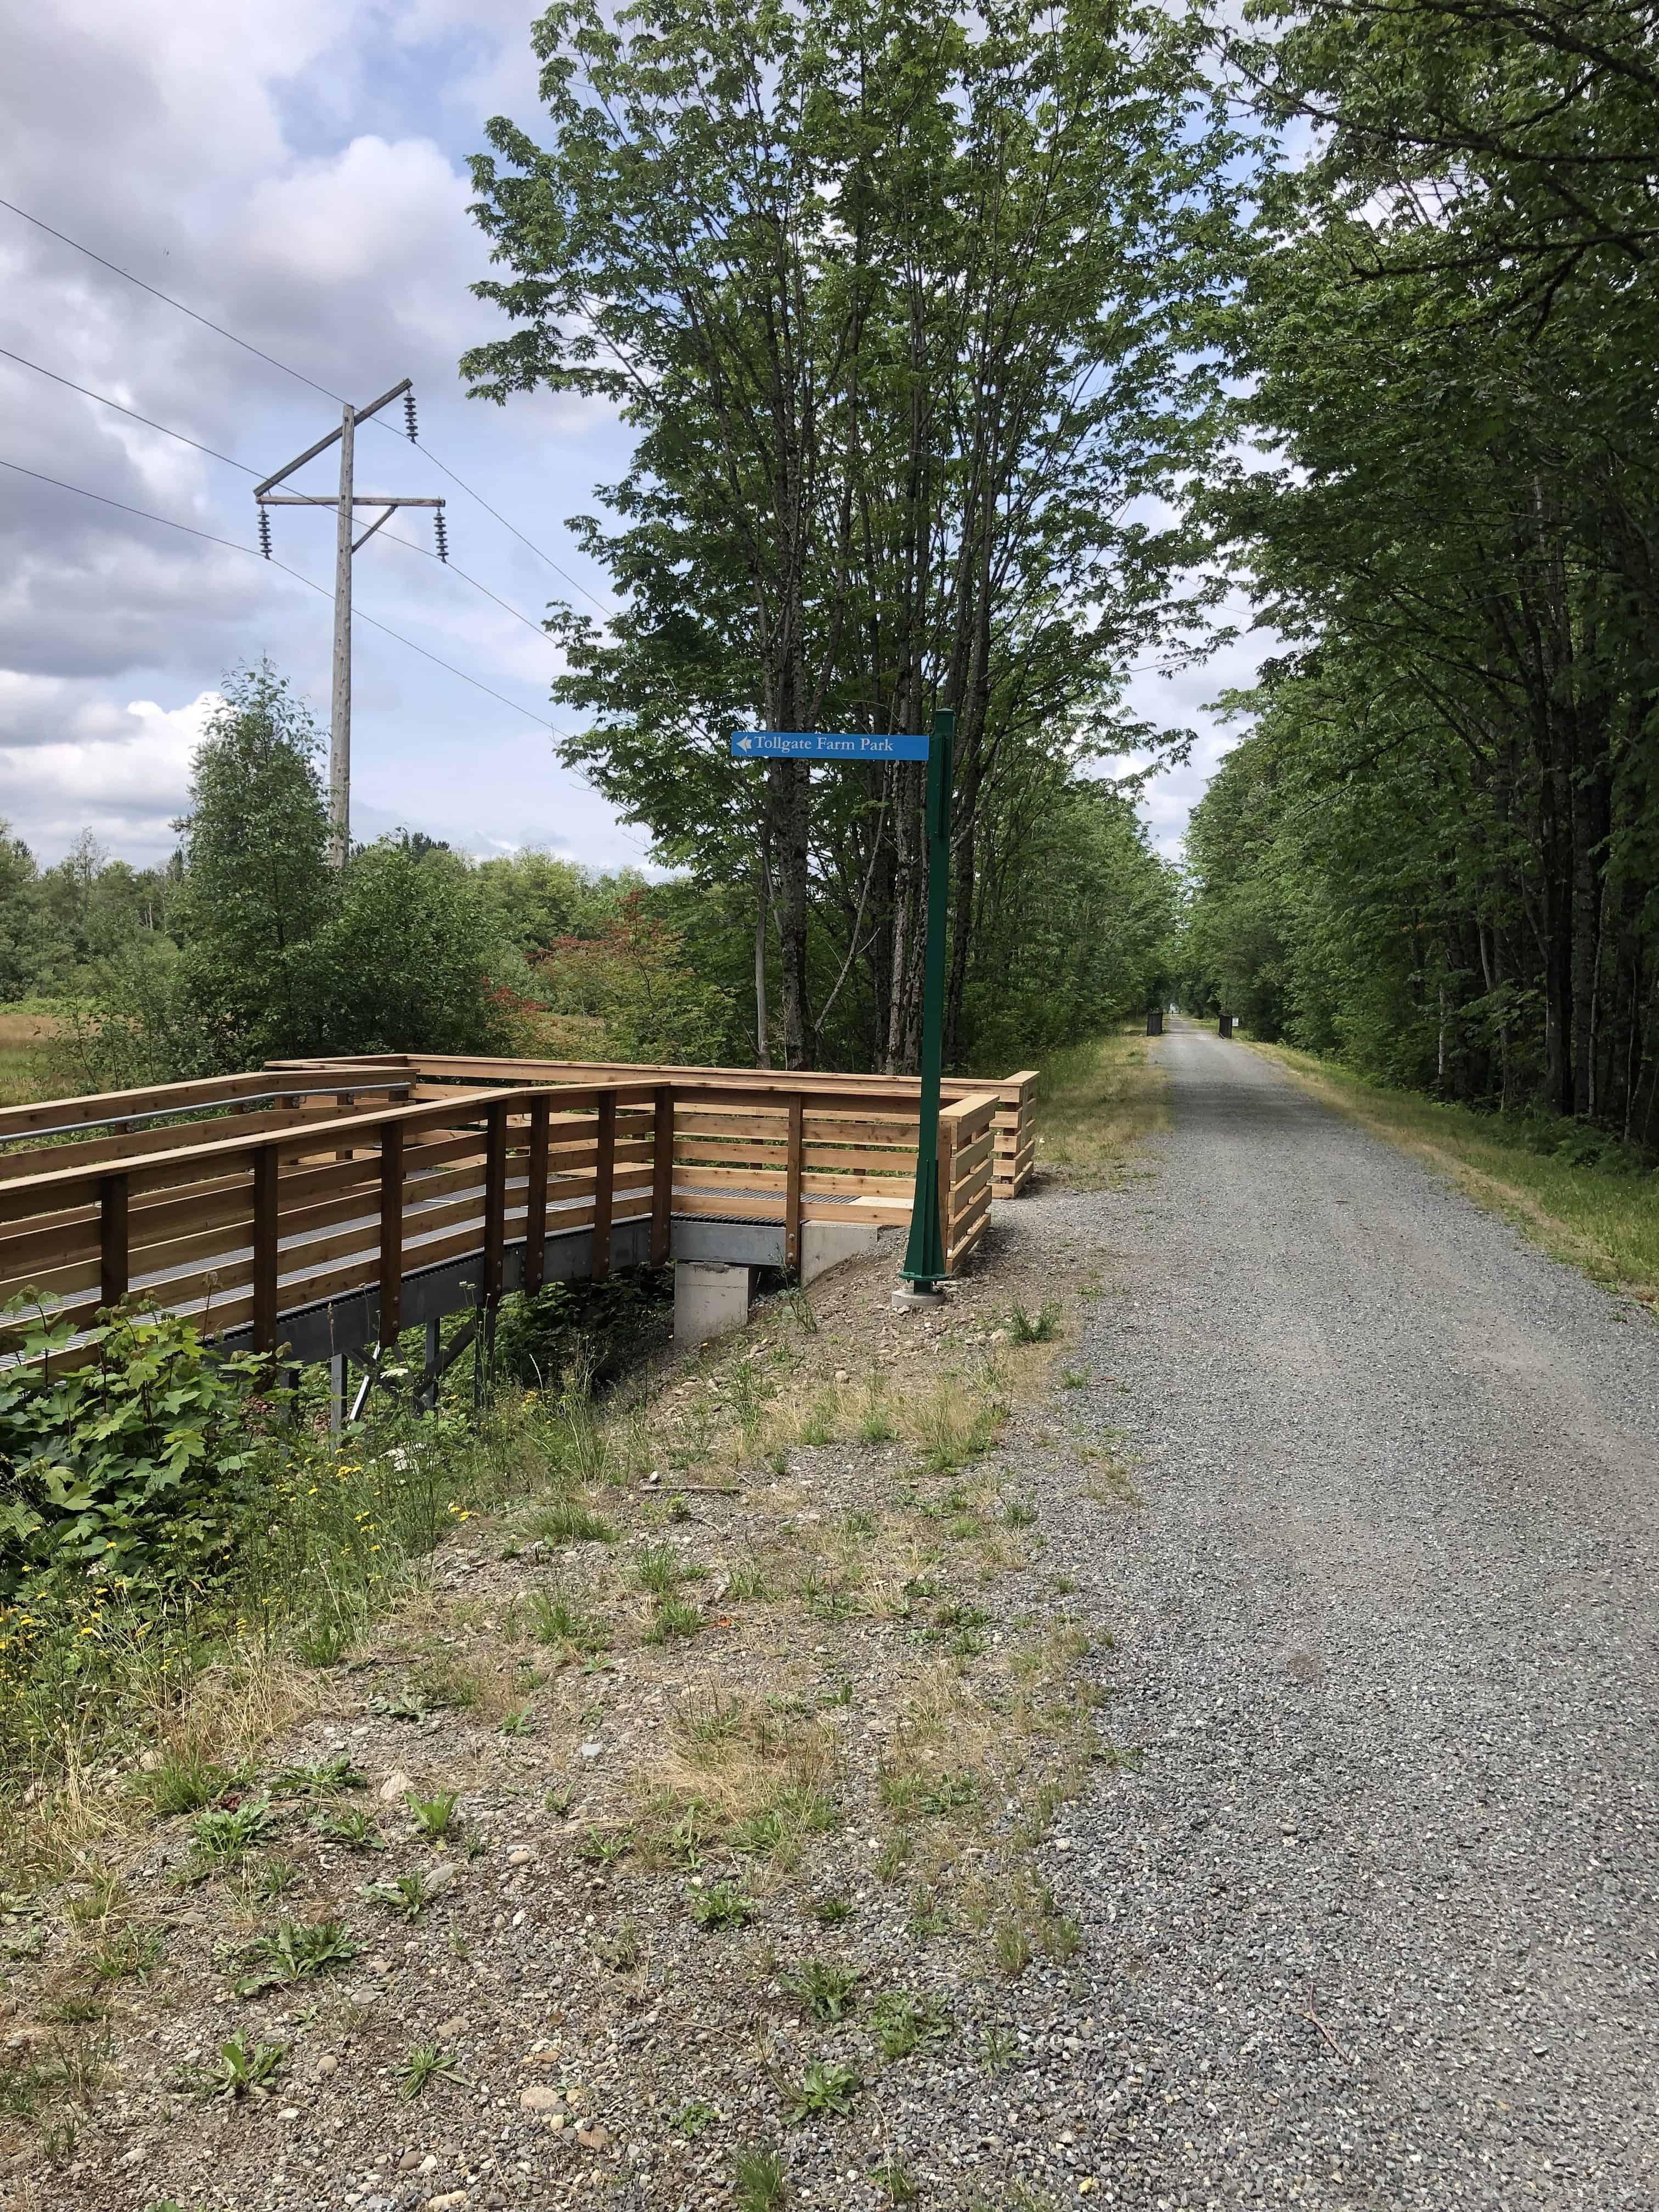 Snoqualmie Valley Trail - Tollgate Farm Park Junction